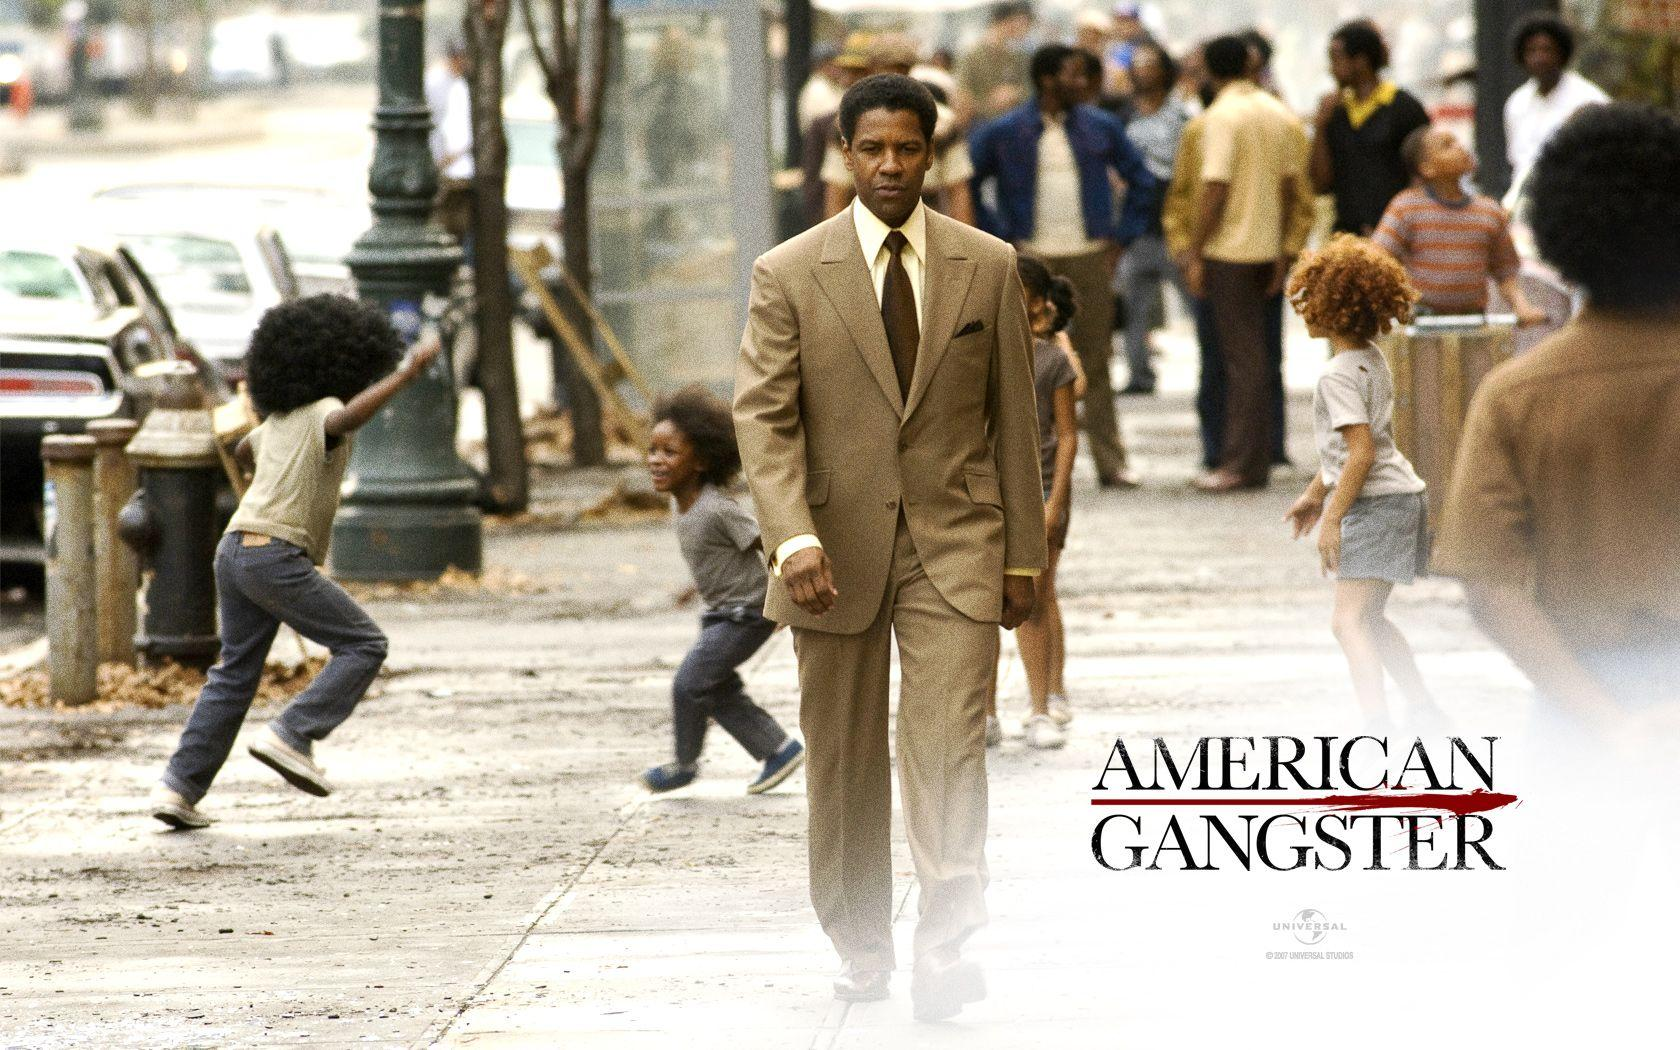 Amerucan Gangster